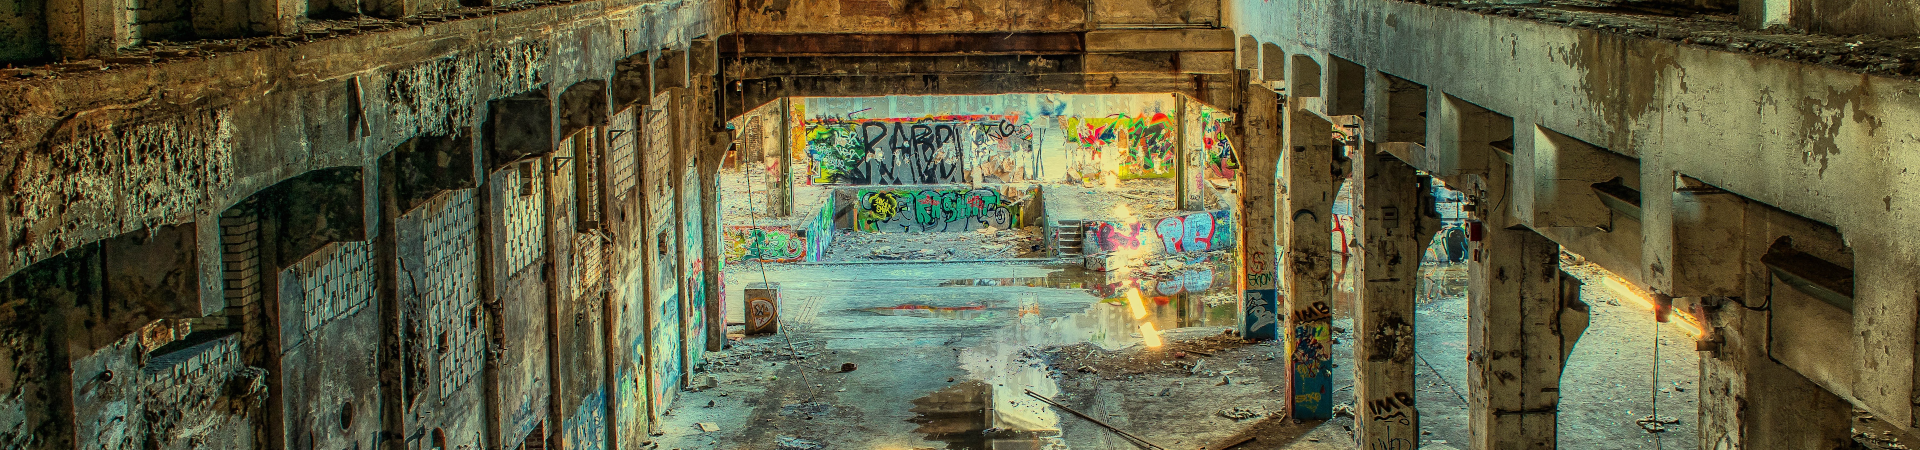 urban-post-industrial-1920×450